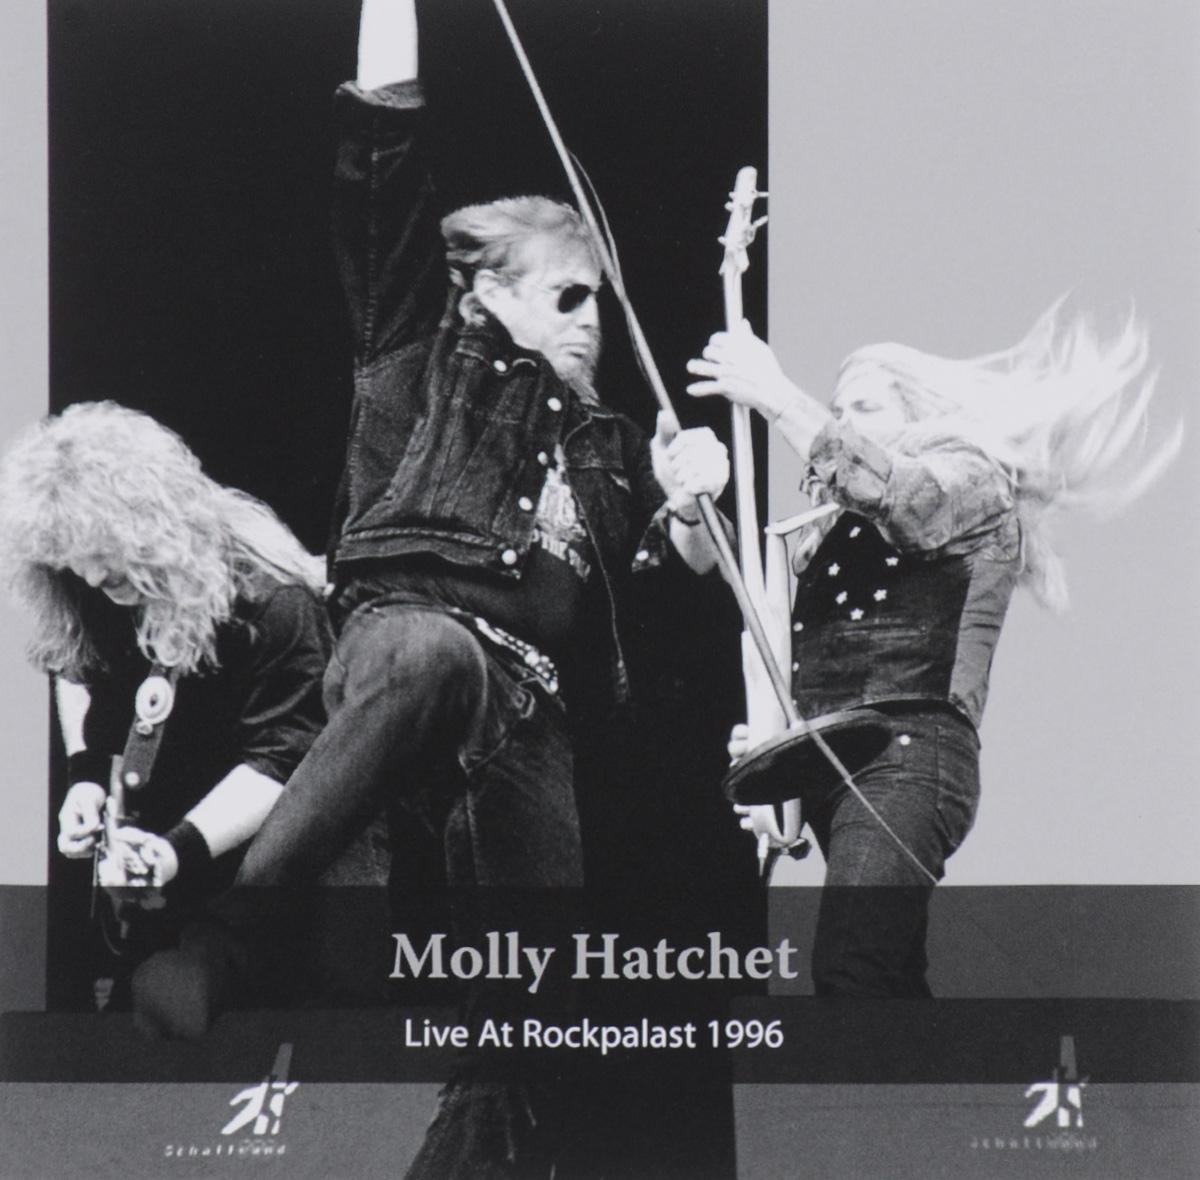 Молли Хатчет Molly Hatchet. Live At Rockpalast 1996